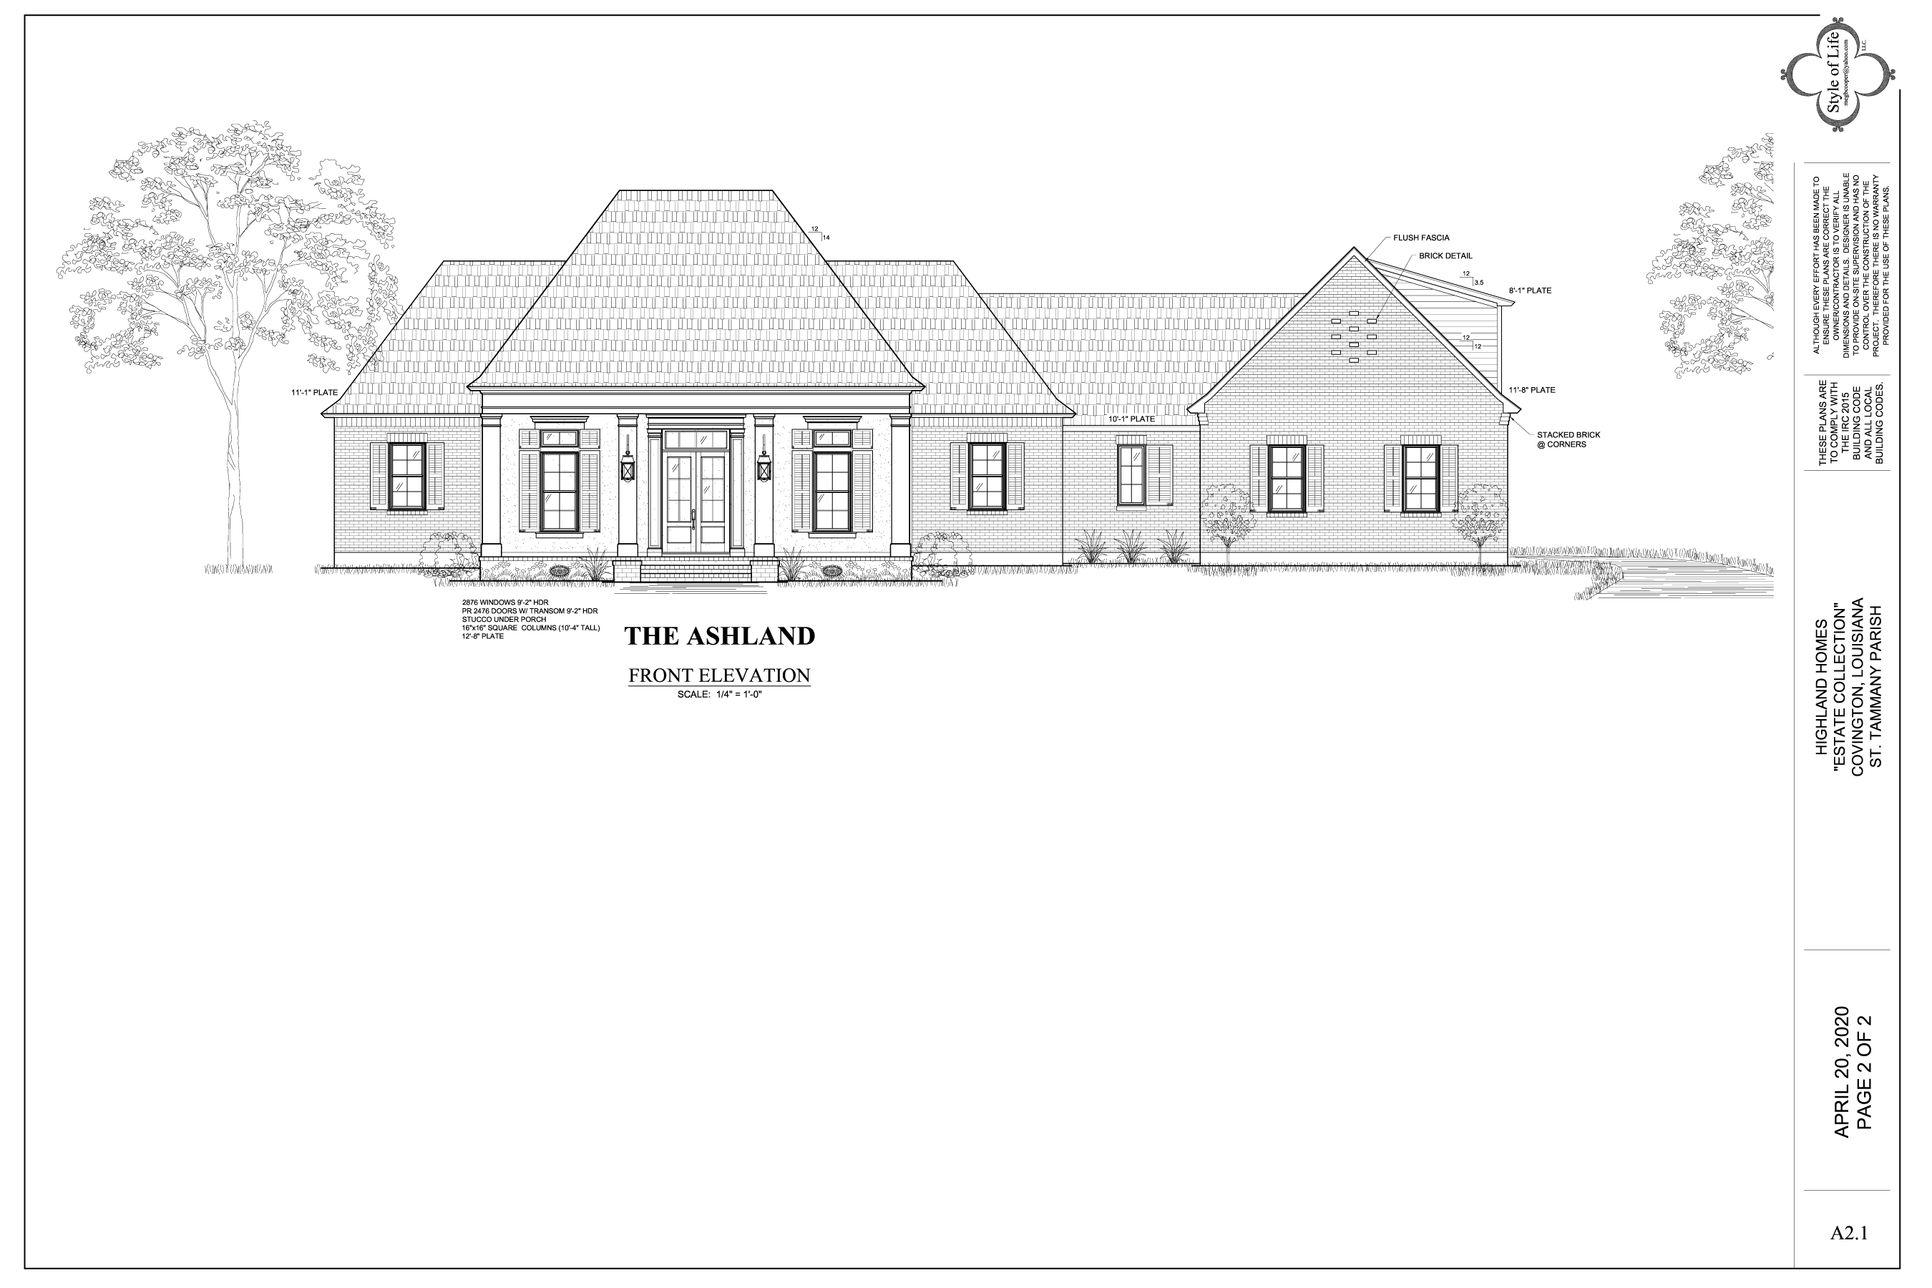 The Ashland - Highland Homes:Front Elevation